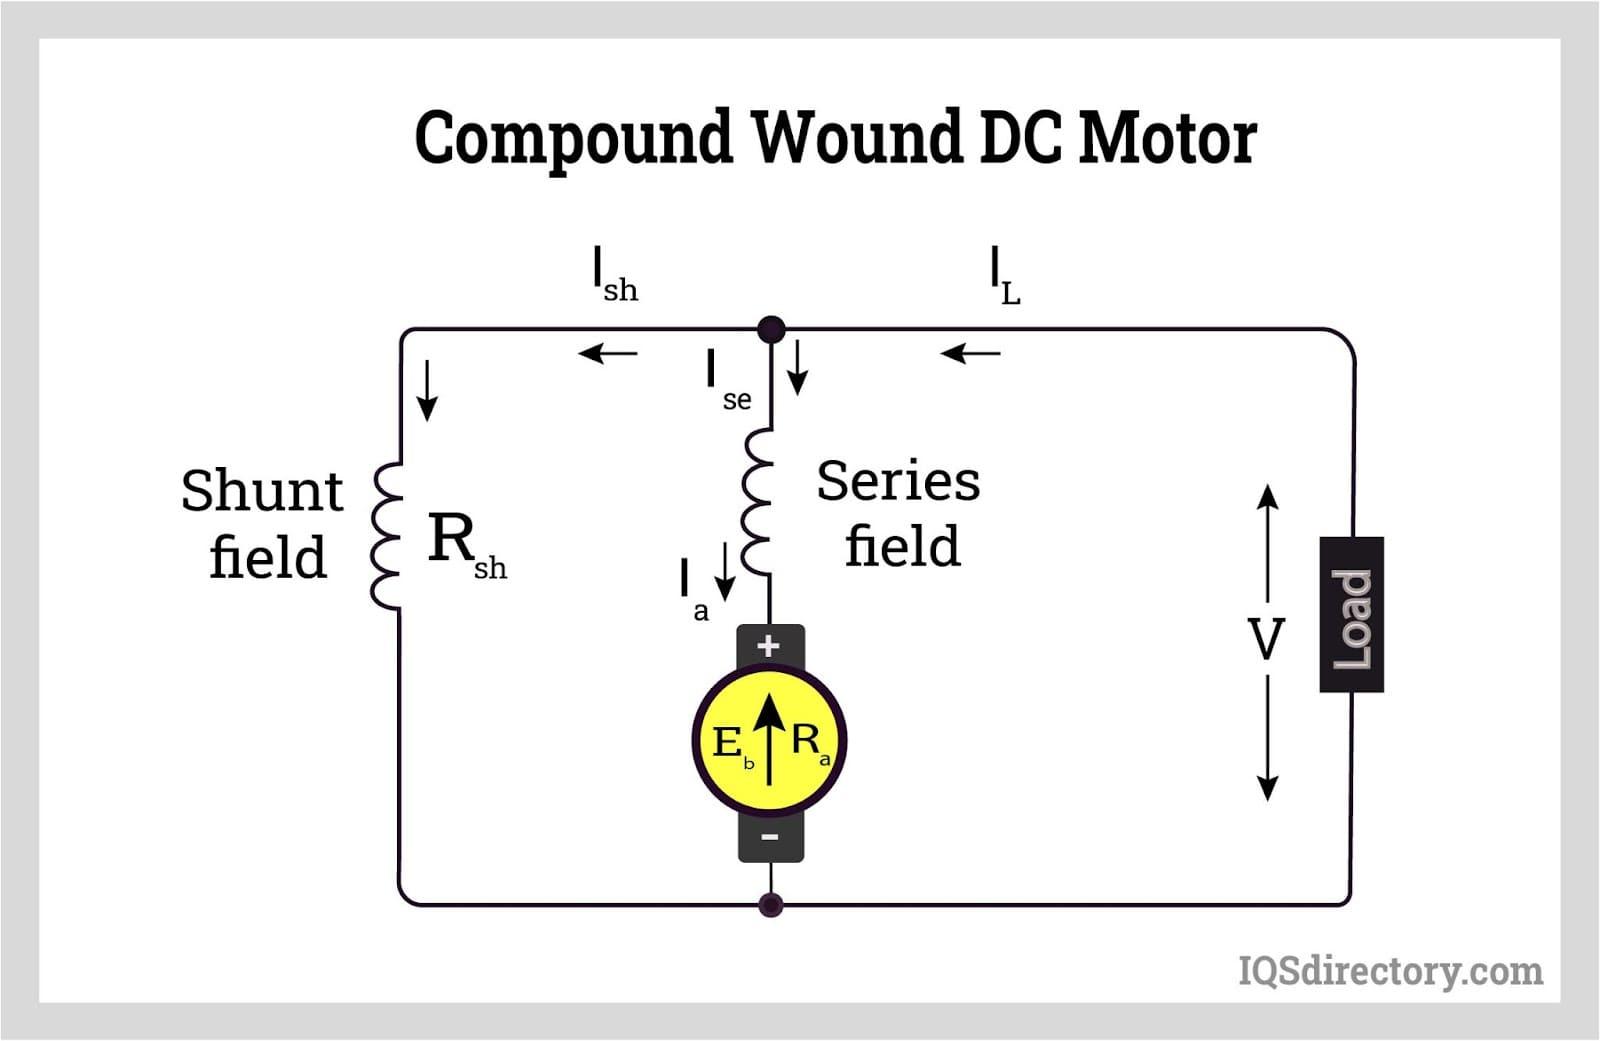 Compound Wound DC Motor